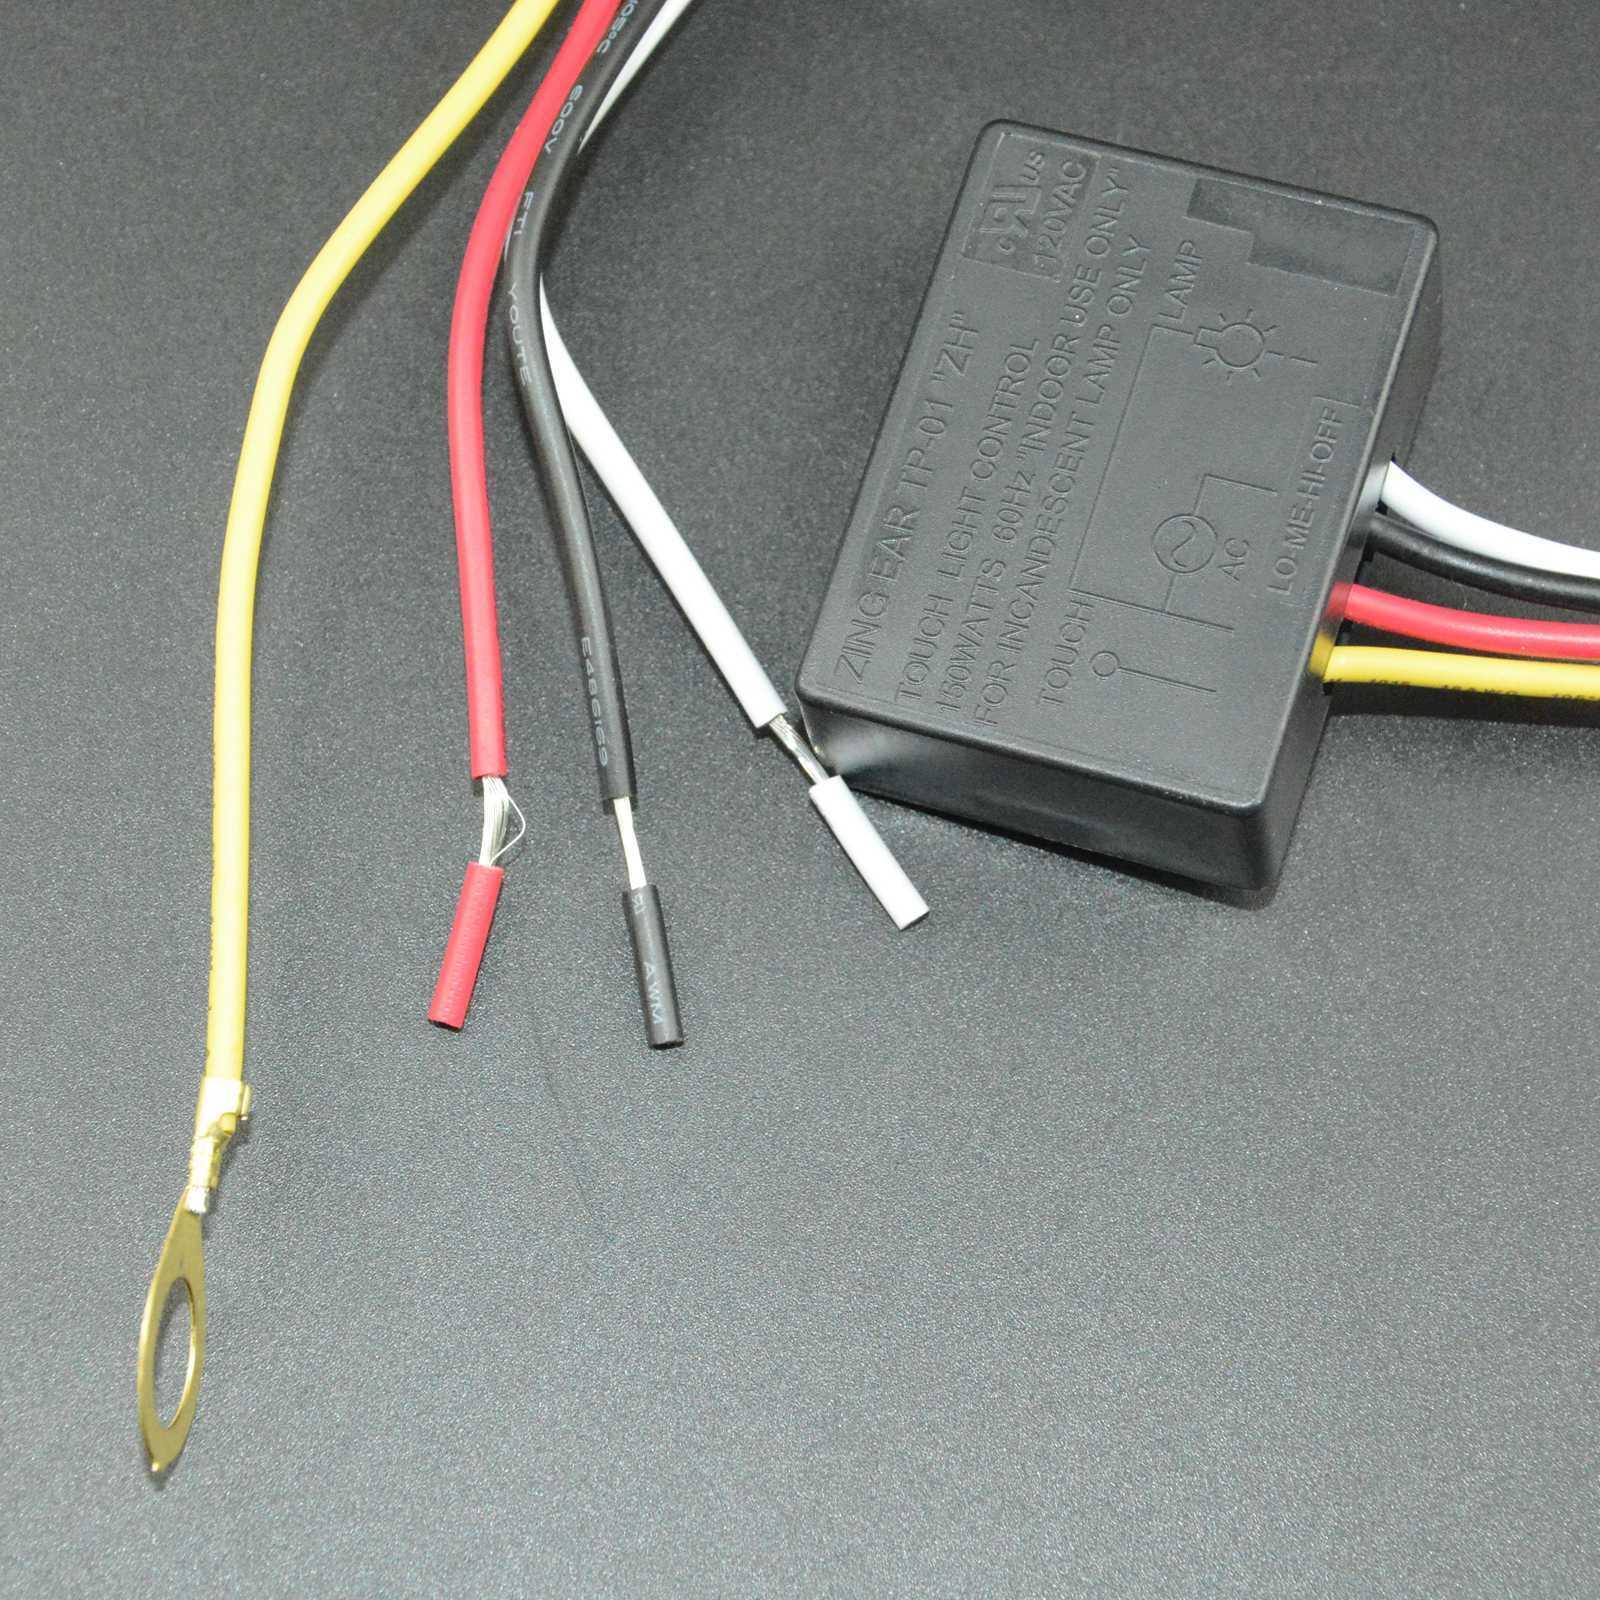 touch dimmer wiring diagram westek touch dimmer wiring diagram wiring diagrams show  westek touch dimmer wiring diagram